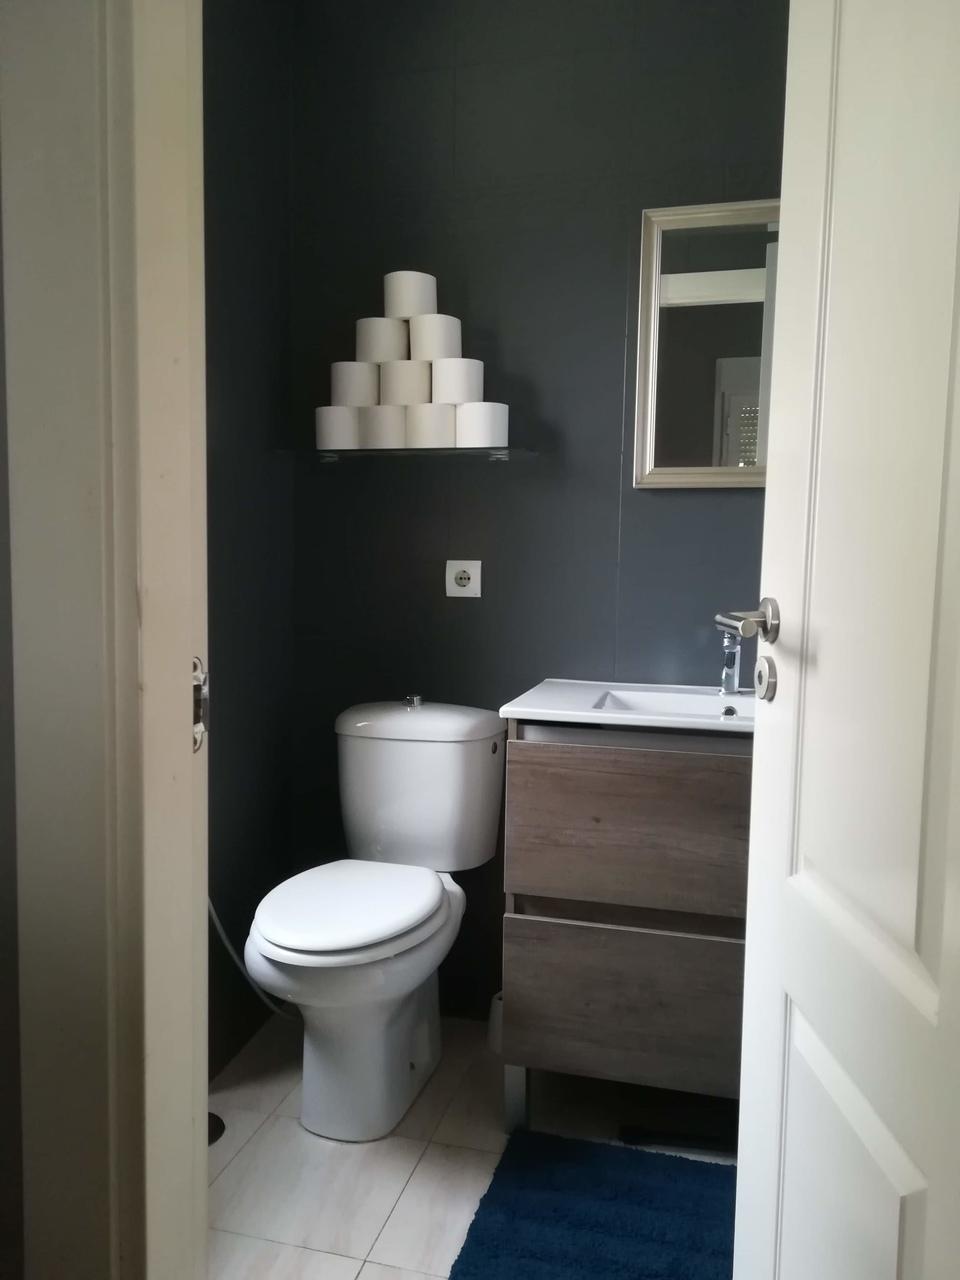 KAROLIINA ESPANJASSA WC